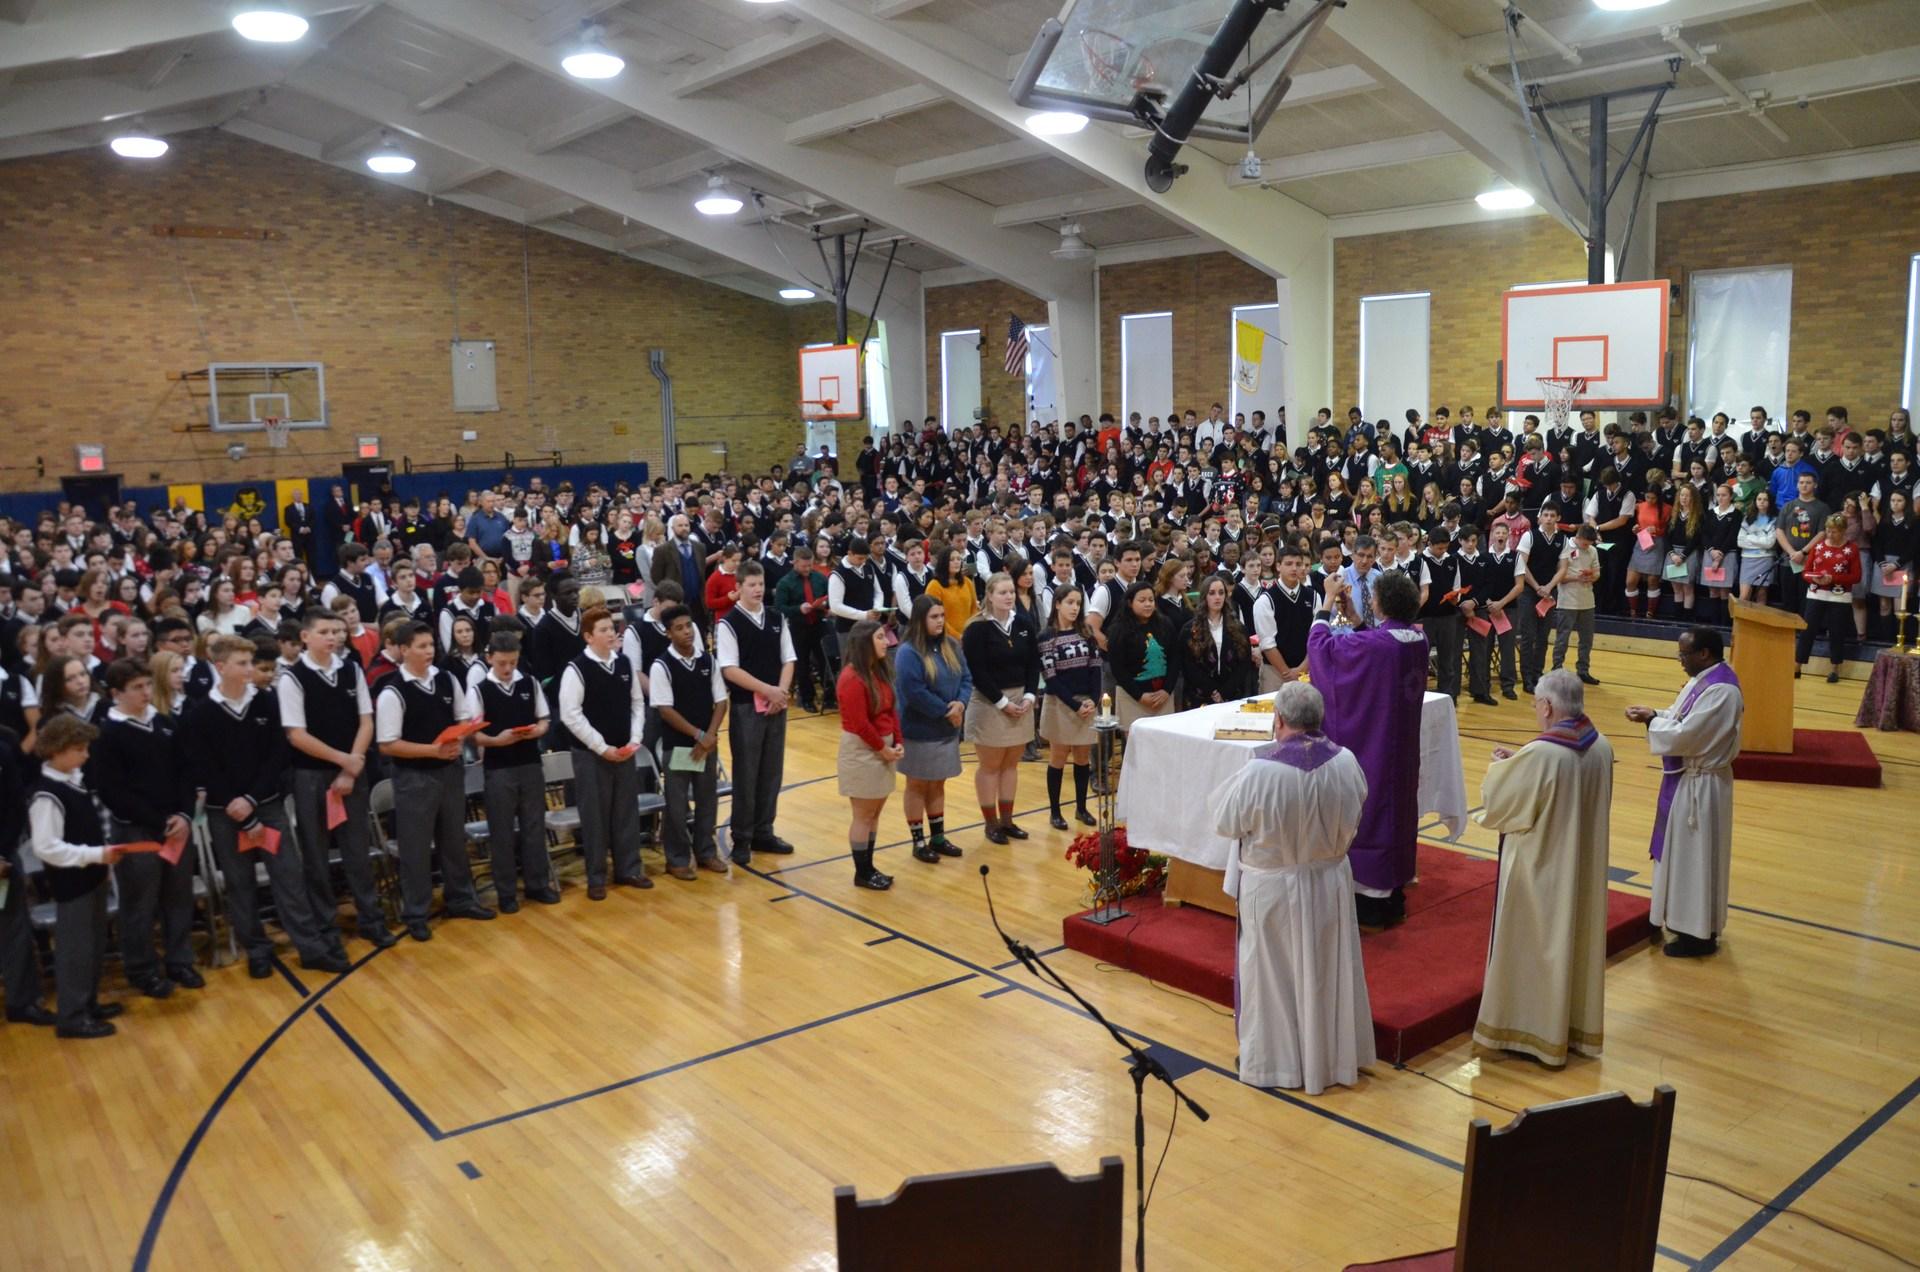 Christmas mass celebration of Eucharist